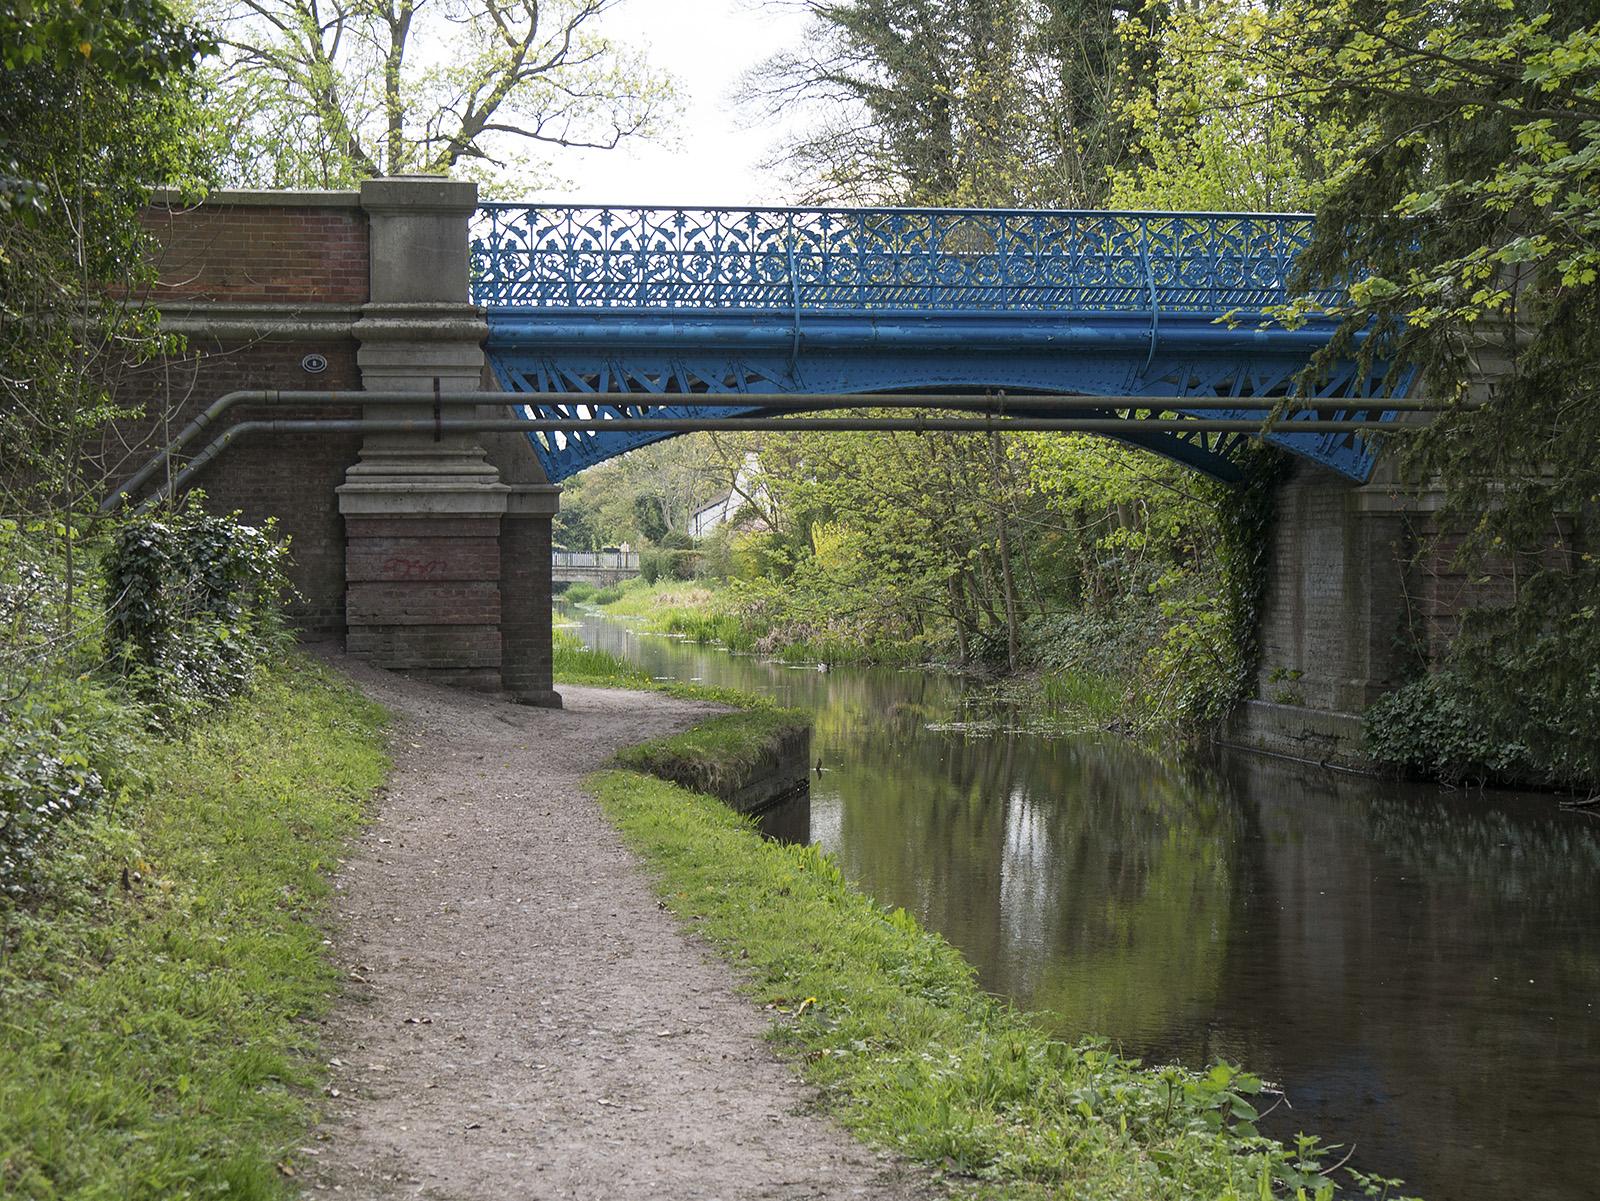 Rothschild bridge